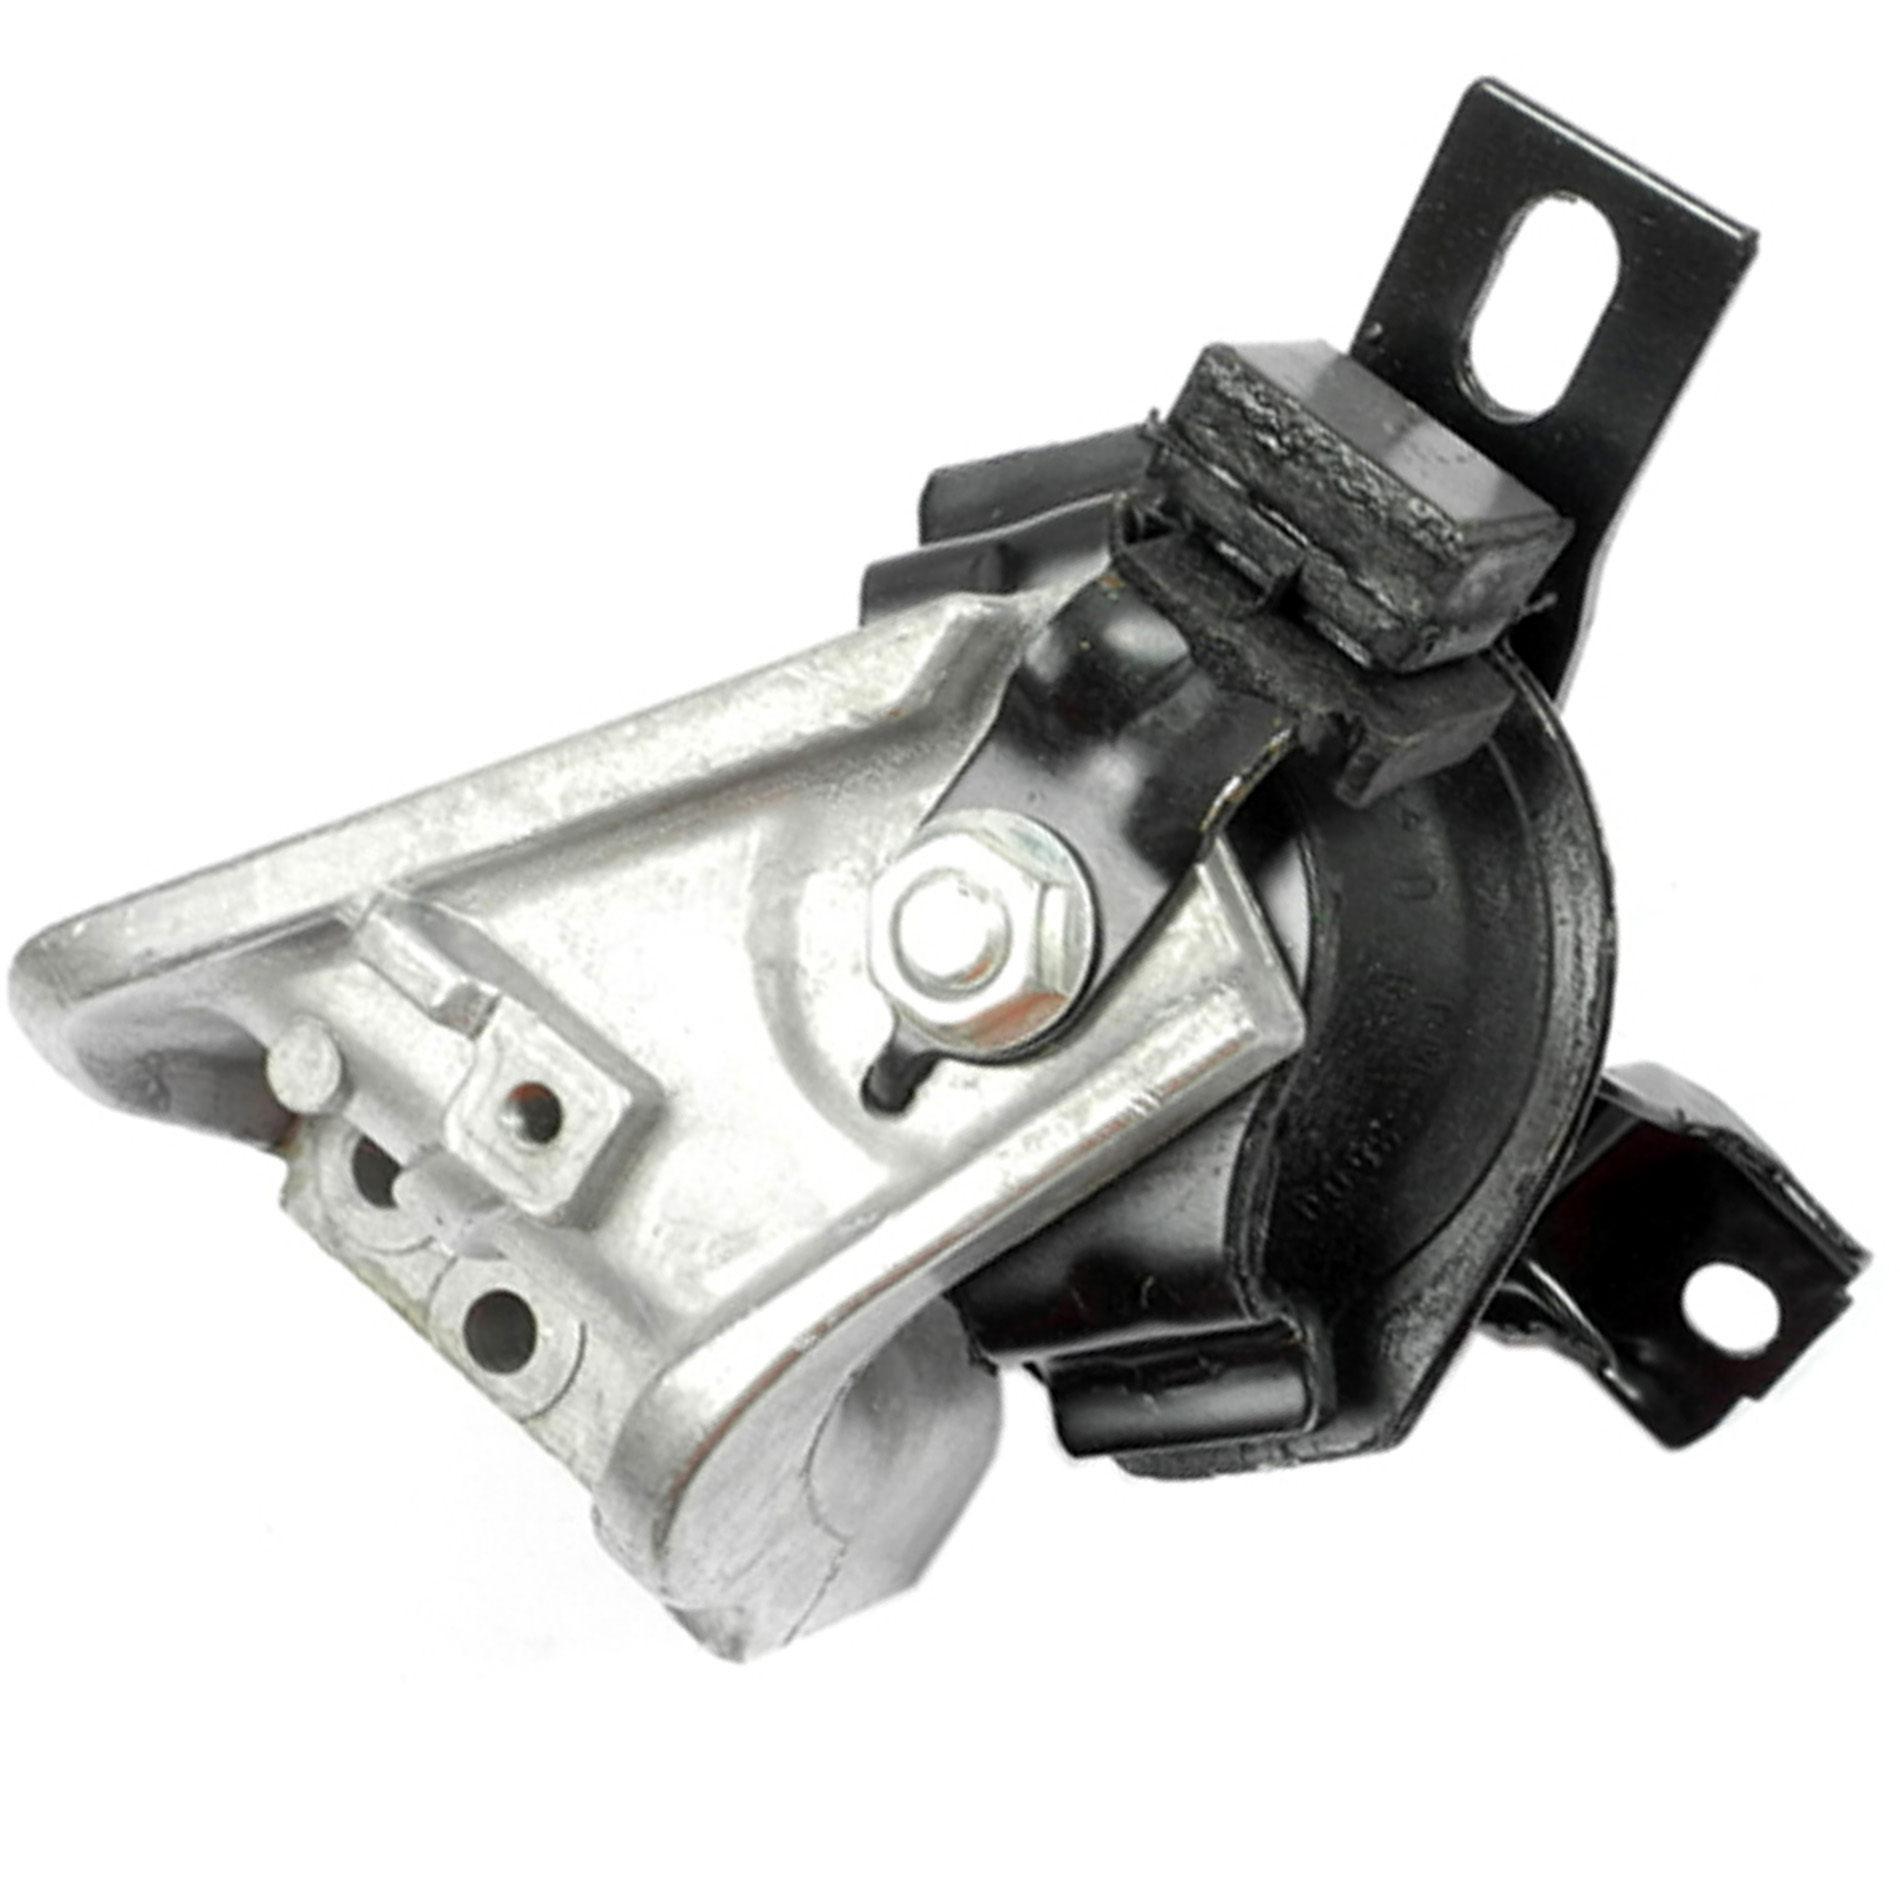 2003-2006 For Mitsubishi Outlander 2.4L Front Right Engine Motor Mount 4642